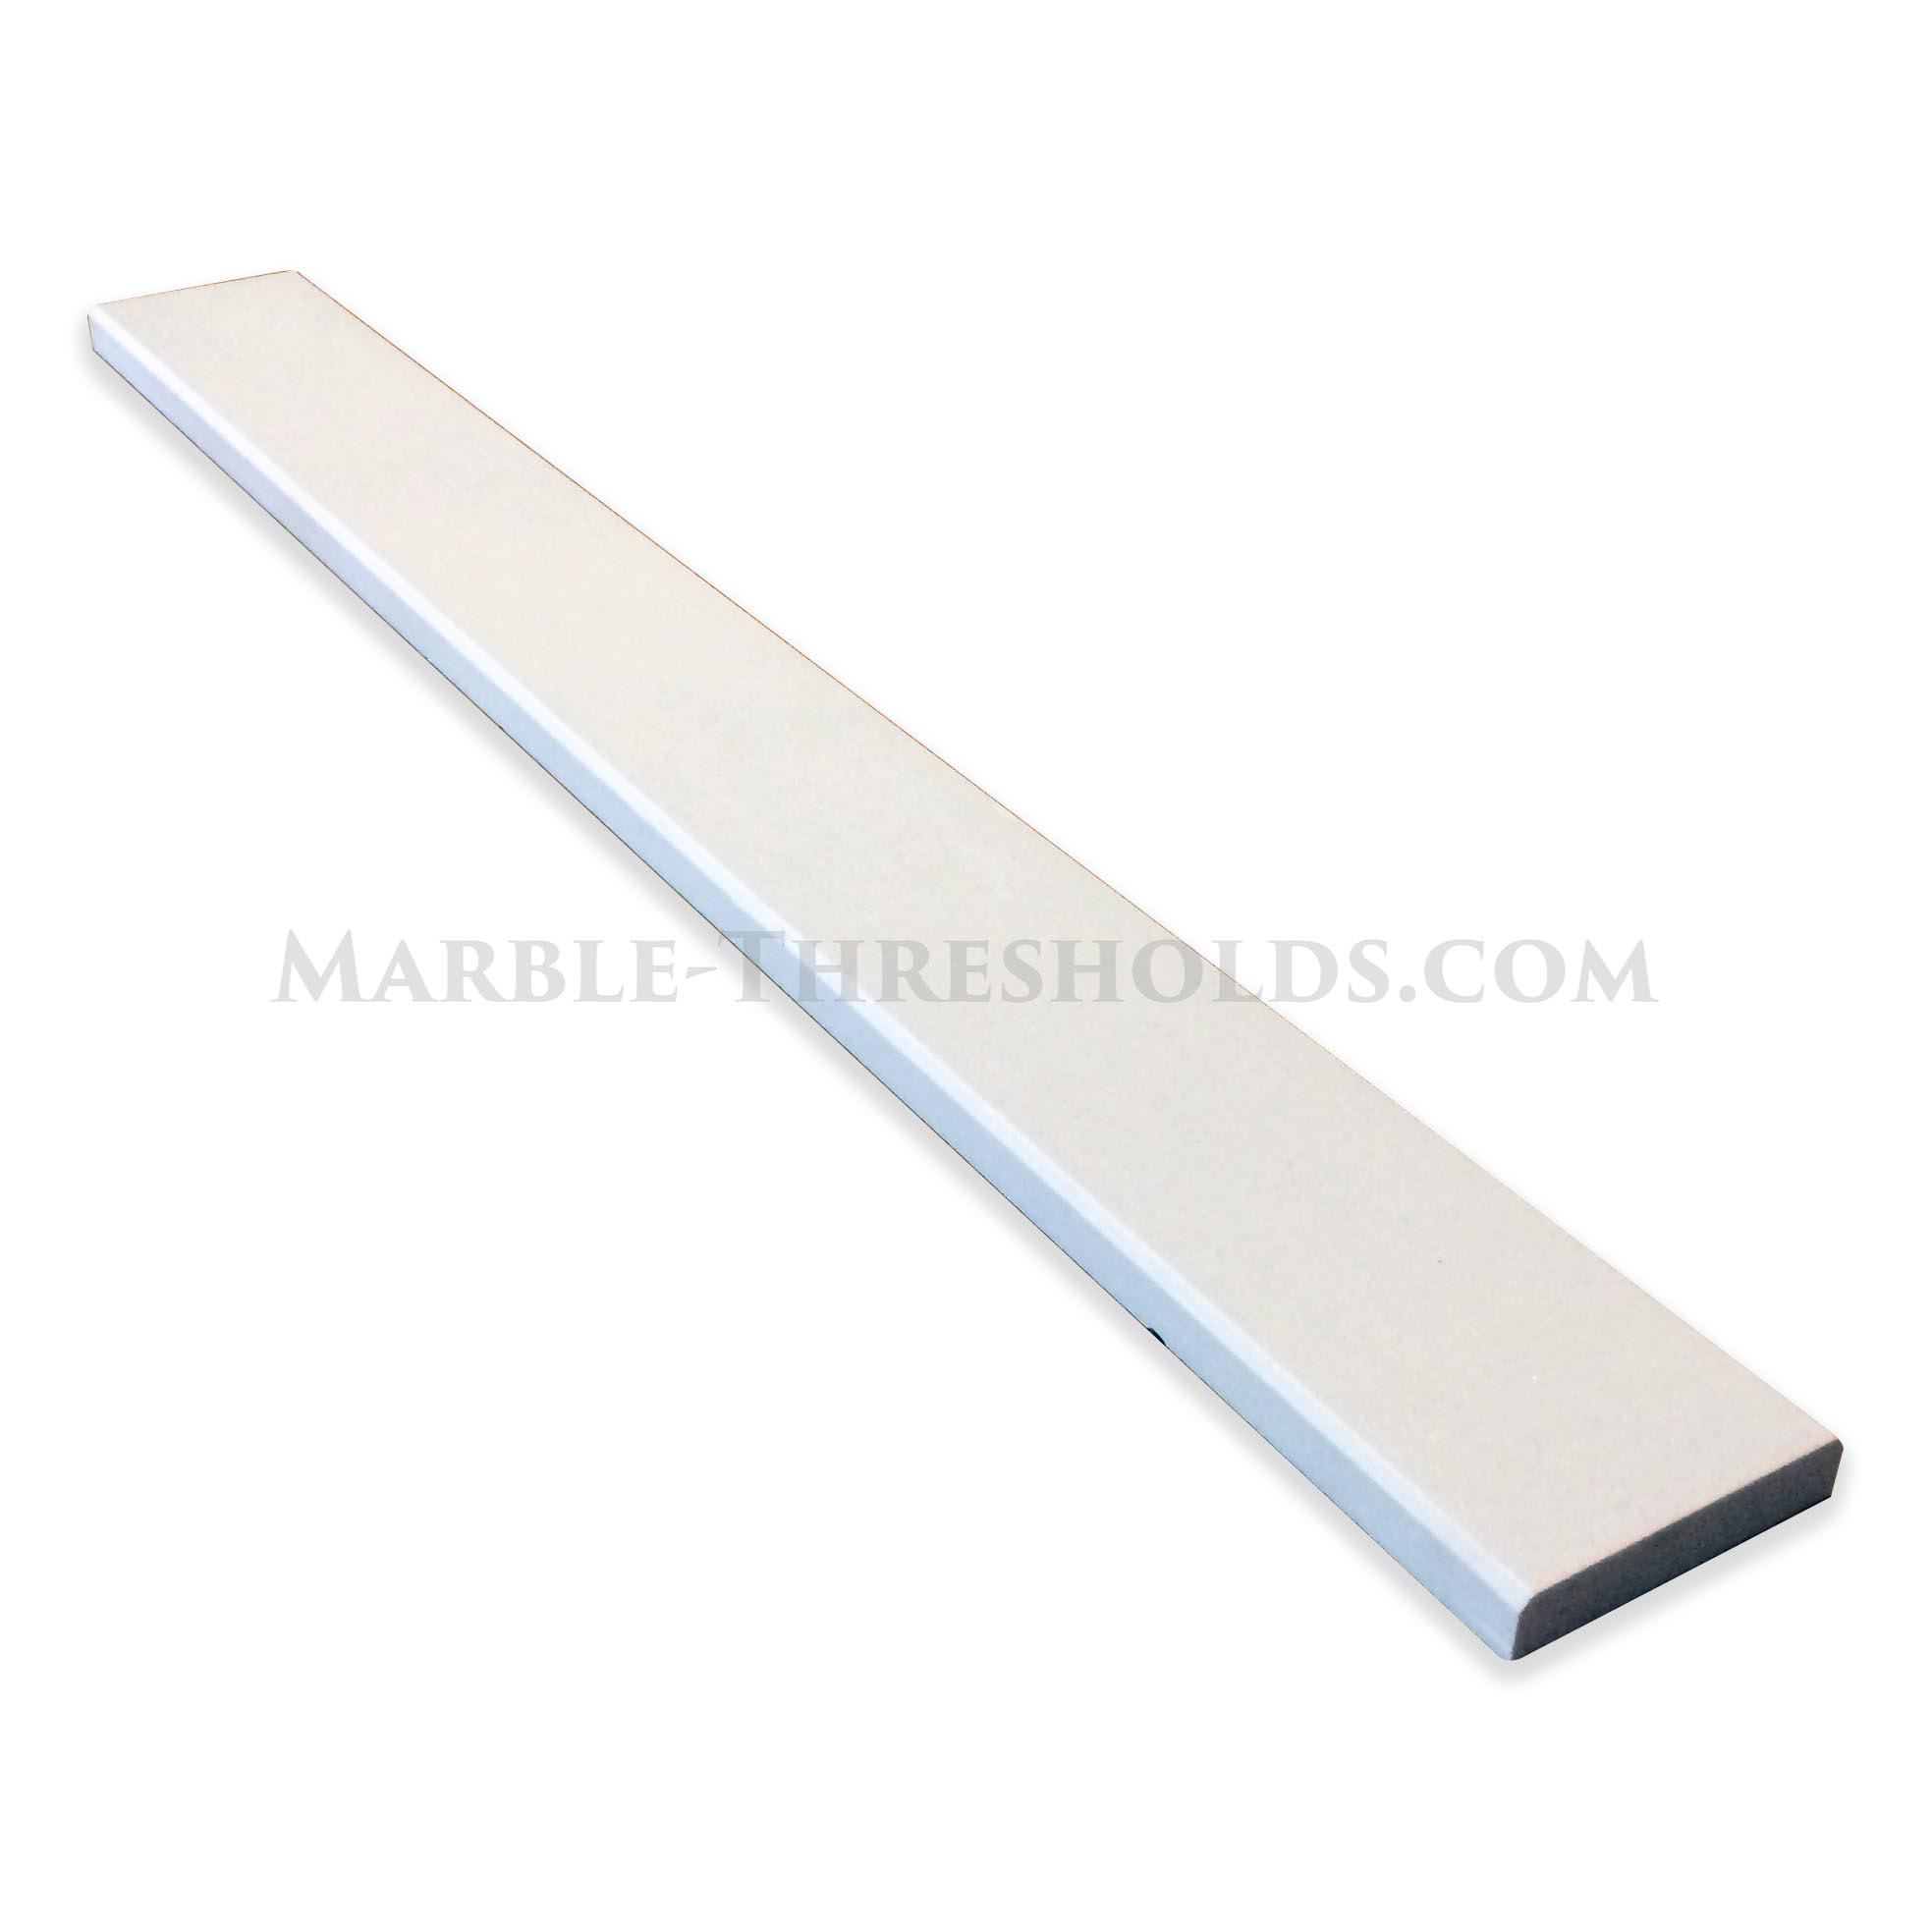 Pure White Engineered Quartz Threshold U2013 Size 36 X 4 Inches